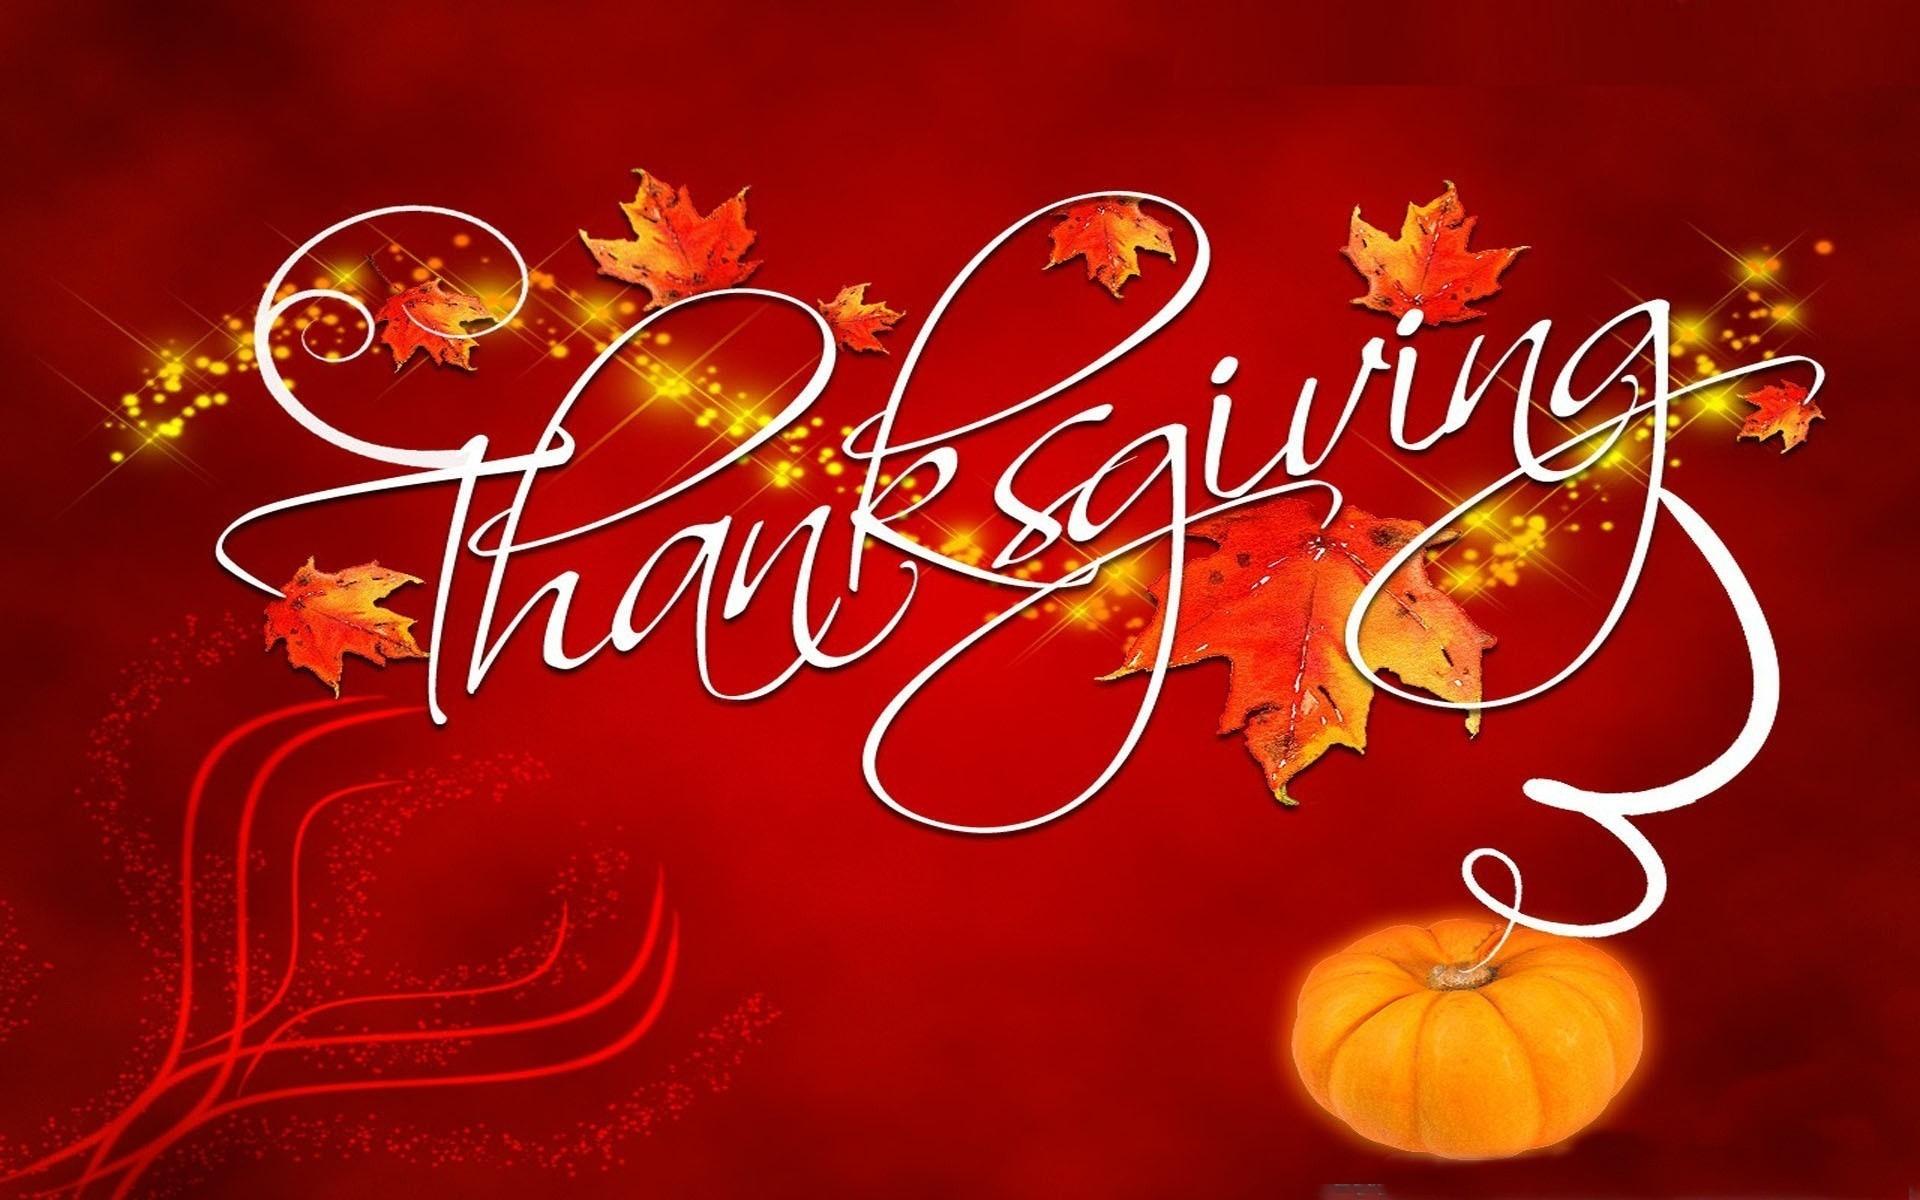 Thanksgiving Wallpaper HD Free Download.